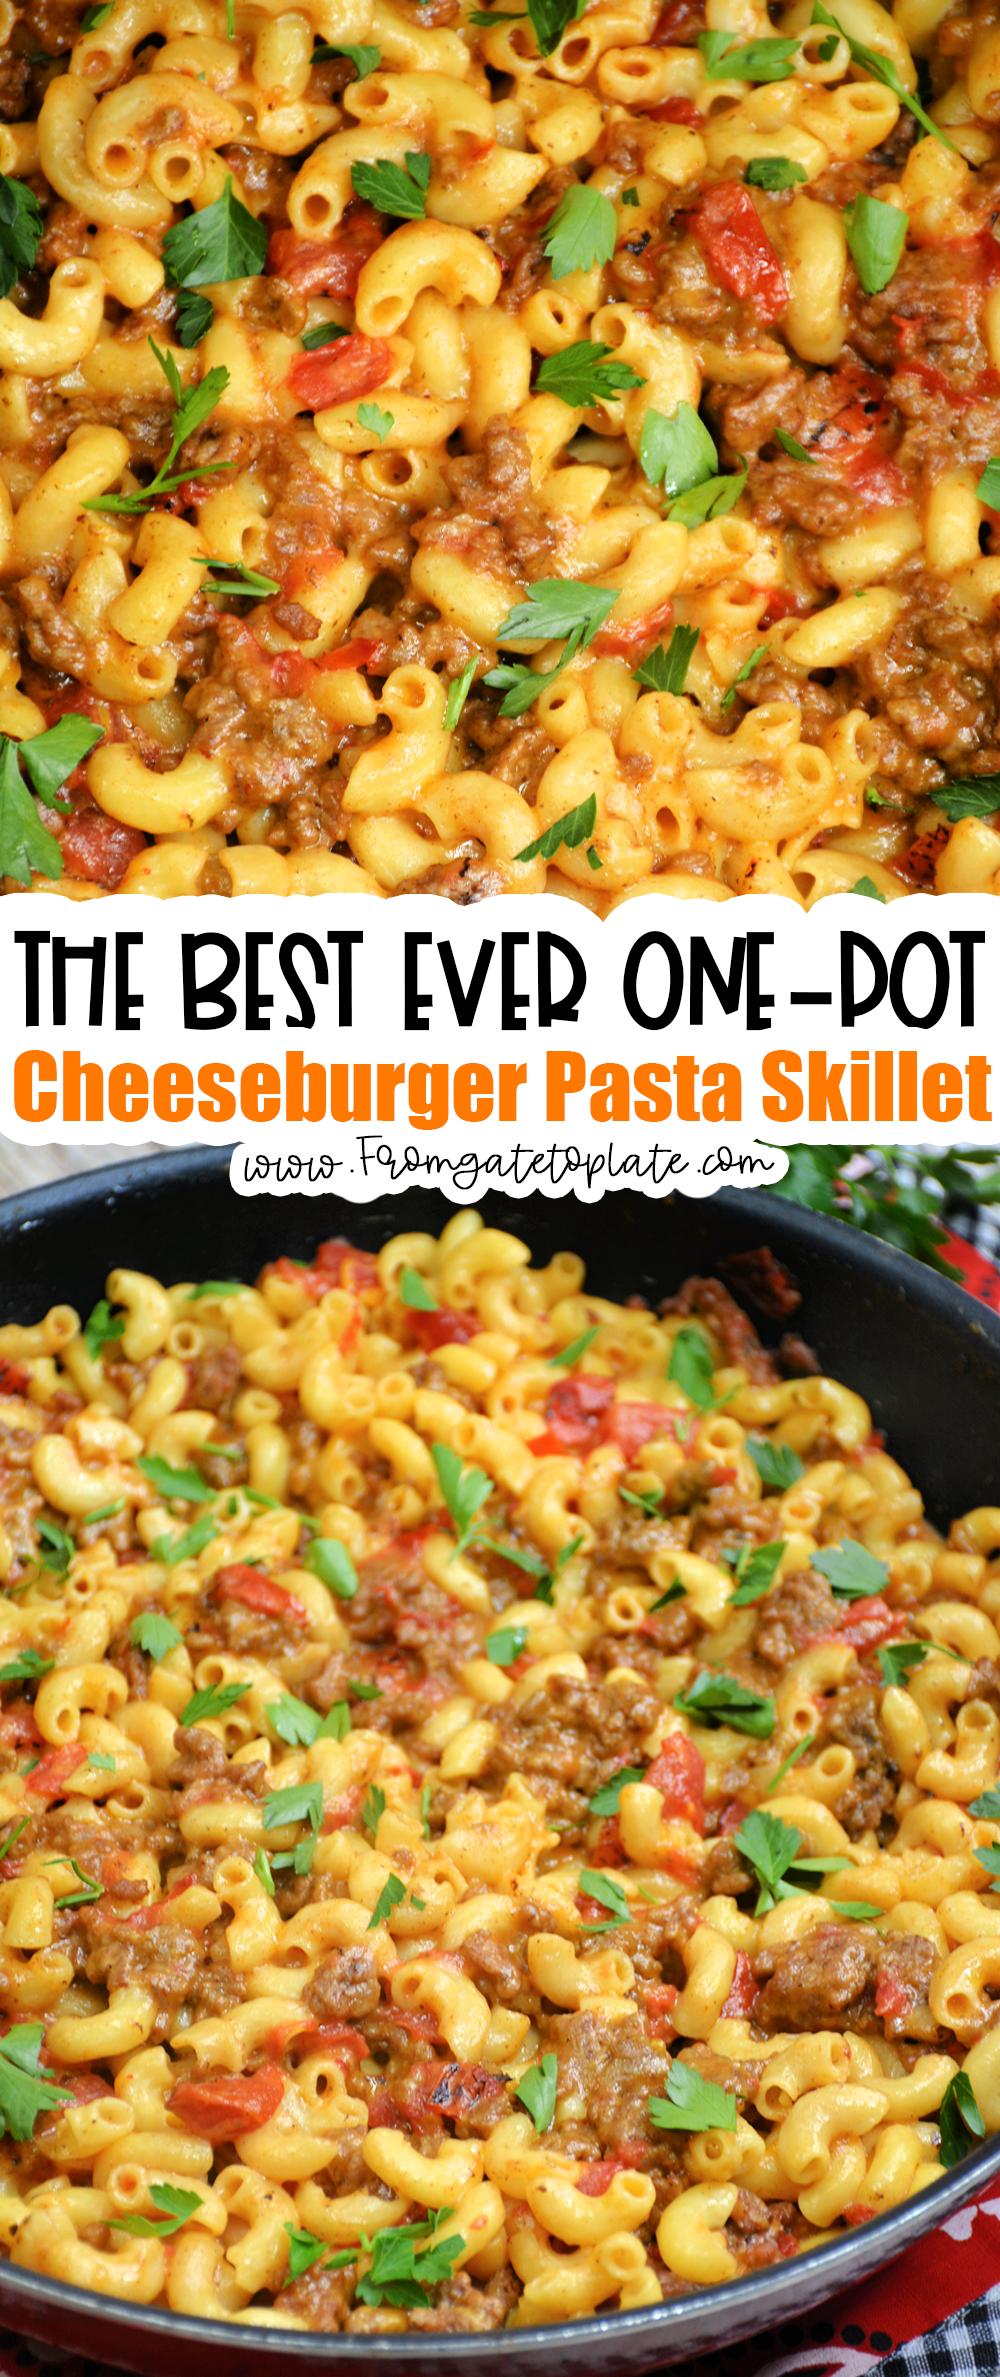 One-Pot Cheeseburger Pasta Skillet